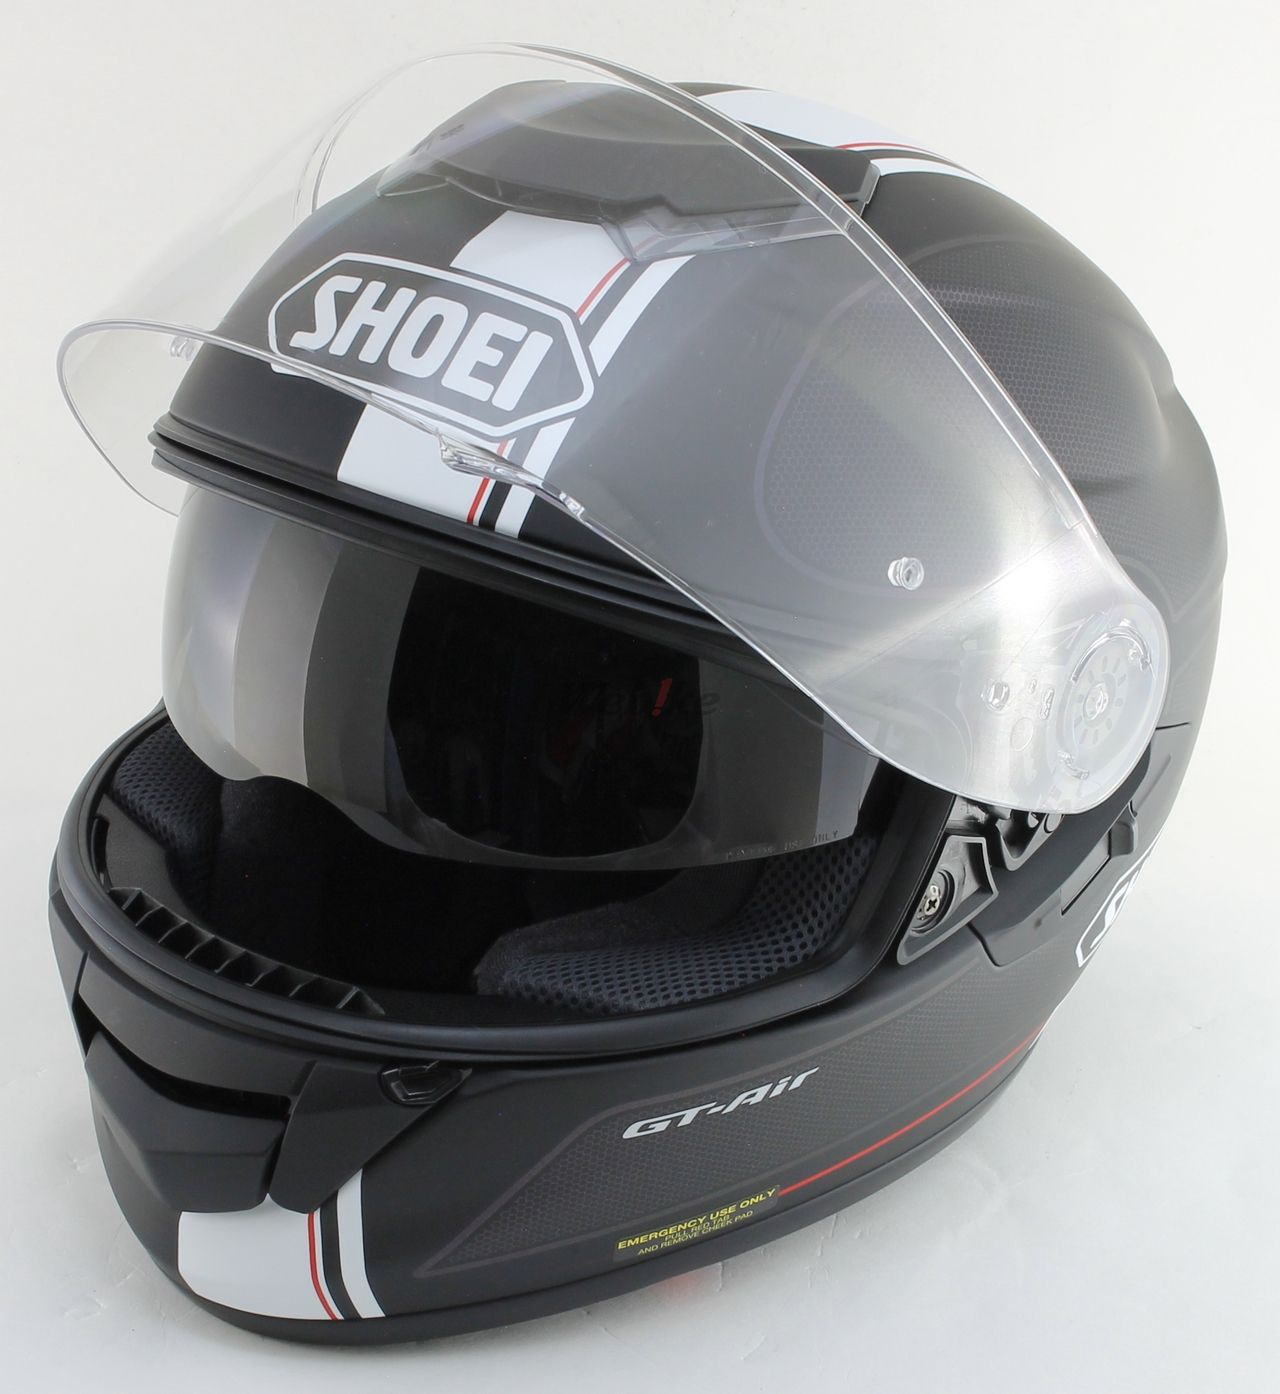 shoei gt air wanderer helmet size xl 61cm. Black Bedroom Furniture Sets. Home Design Ideas